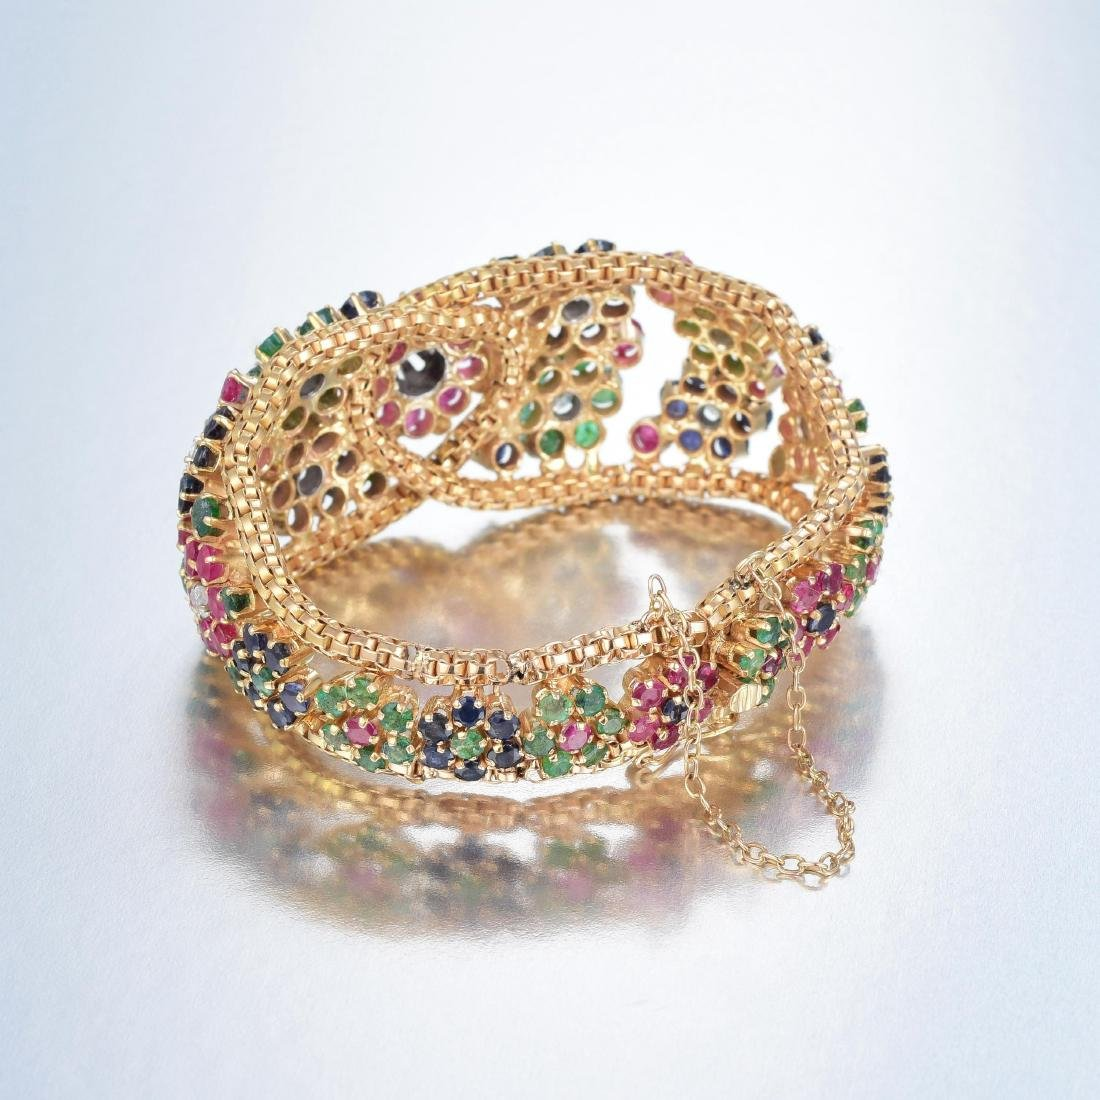 A 14K Gold Diamond, Ruby, Emerald and Sapphire Bracelet - 2